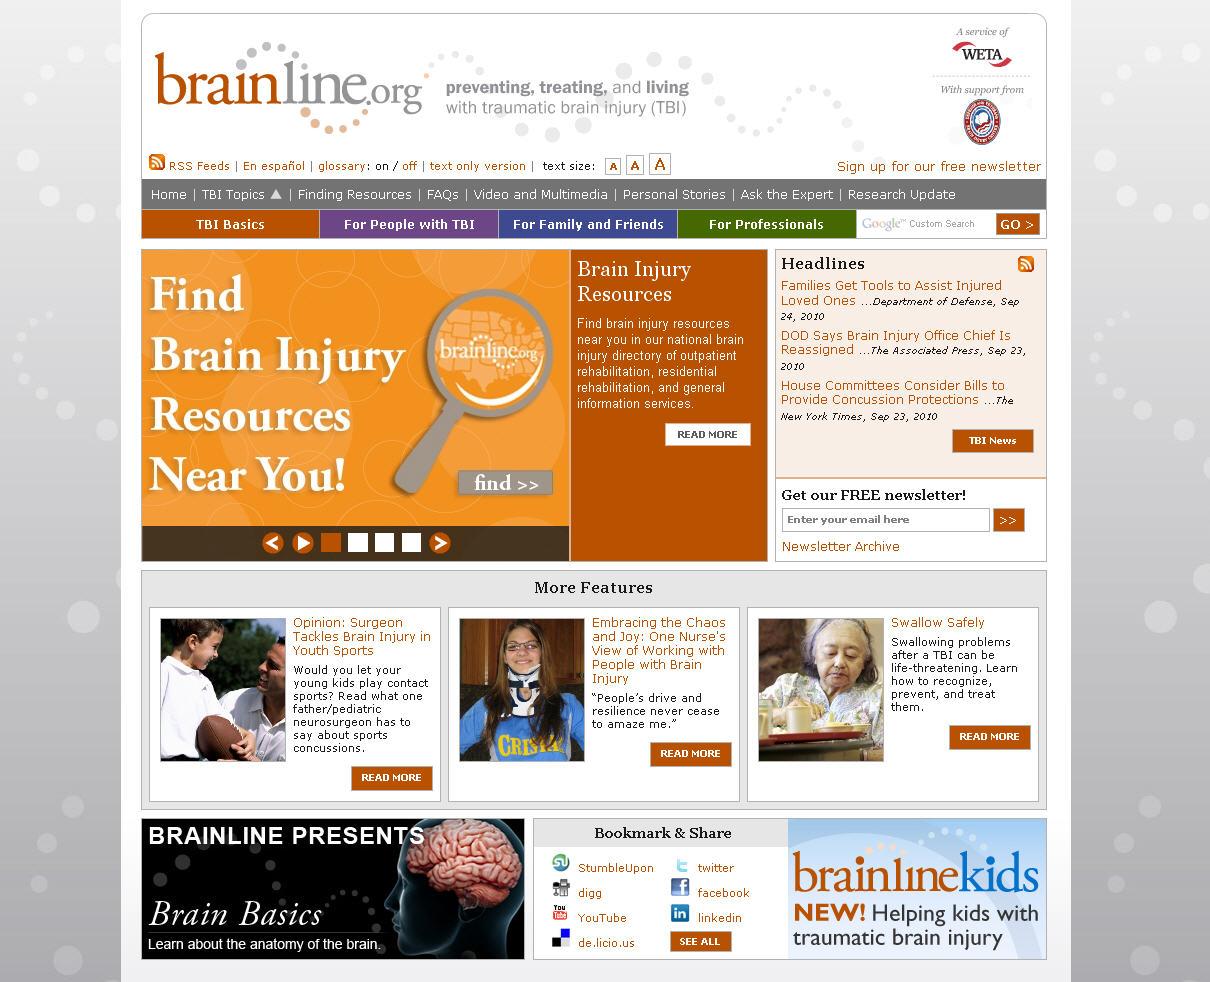 BrainLine.org image